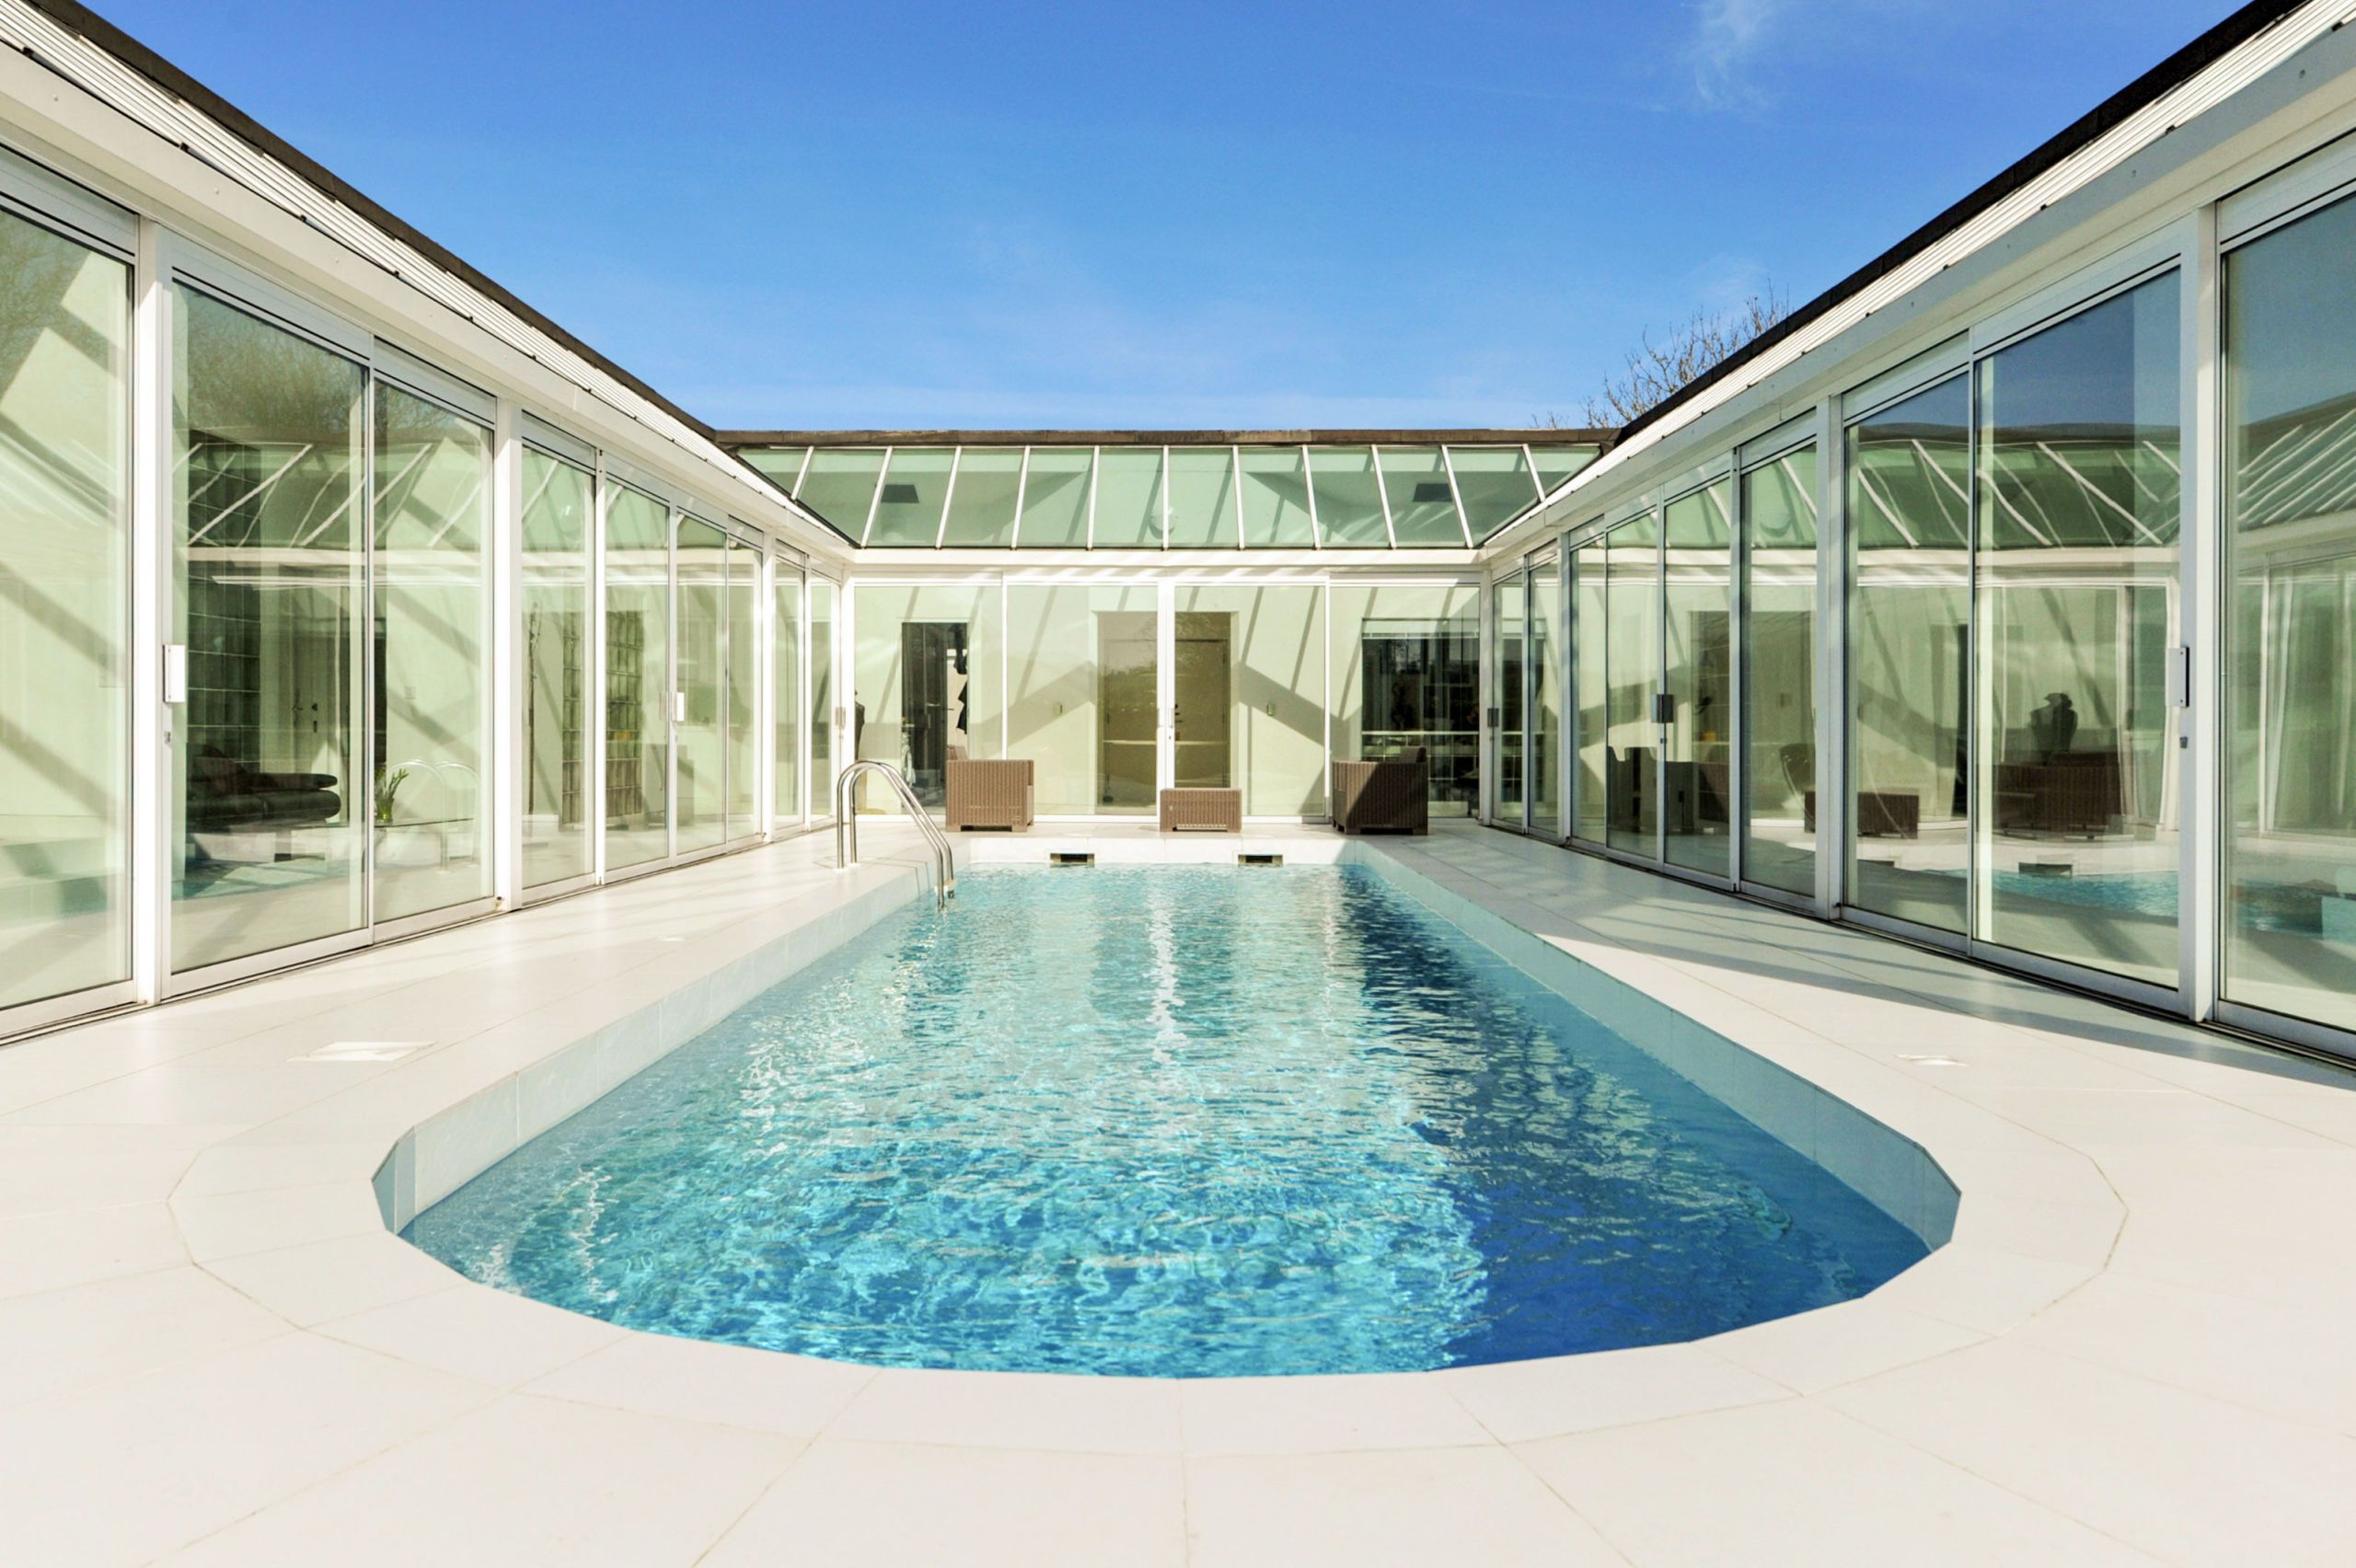 Bank House, Sheepway, Portbury, Bristol   Swimming Pool   Savills